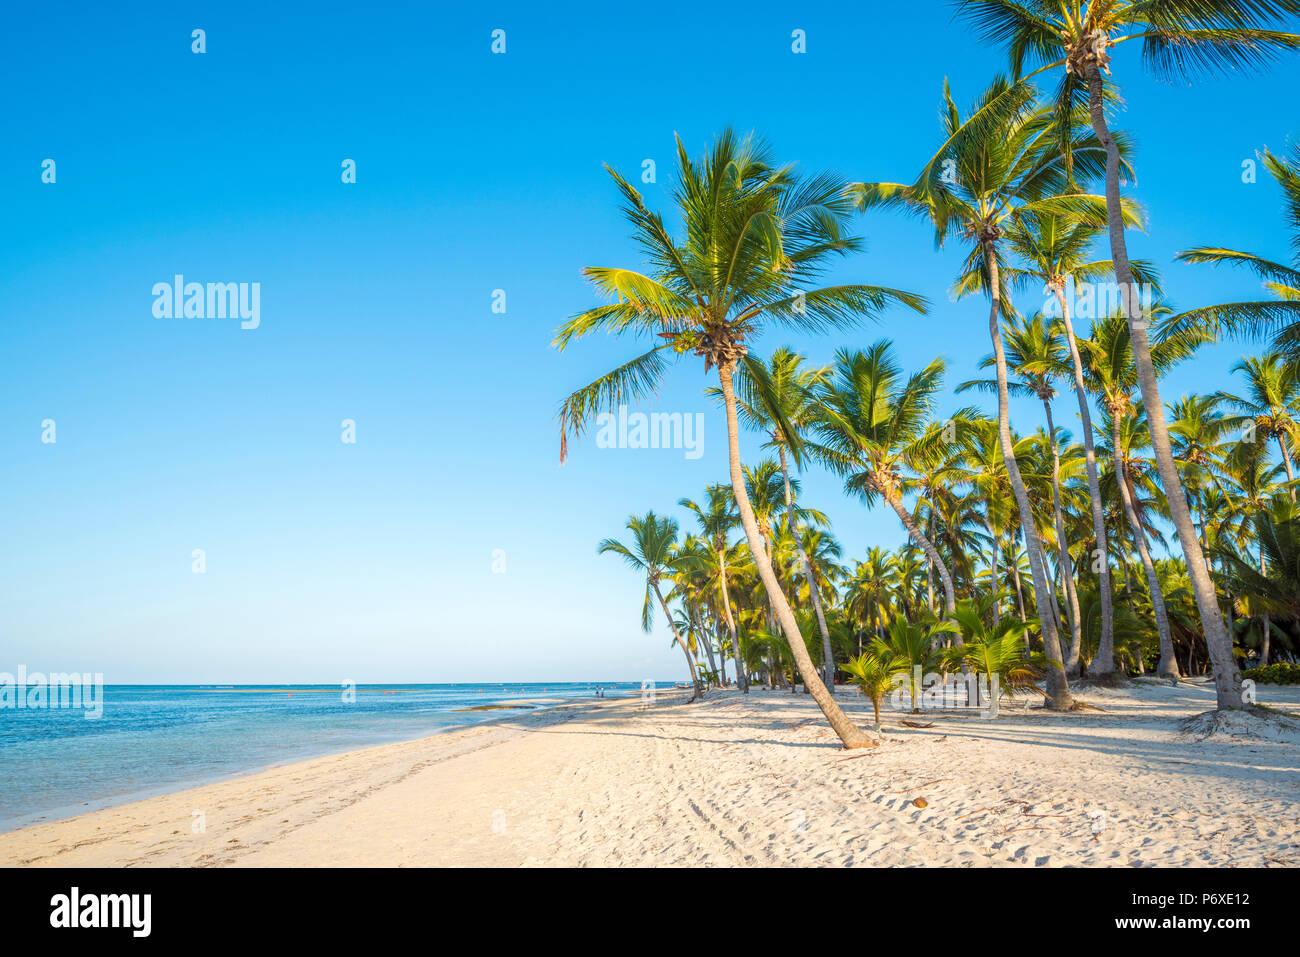 La playa de Cabeza de Toro, Punta Cana, República Dominicana. Imagen De Stock